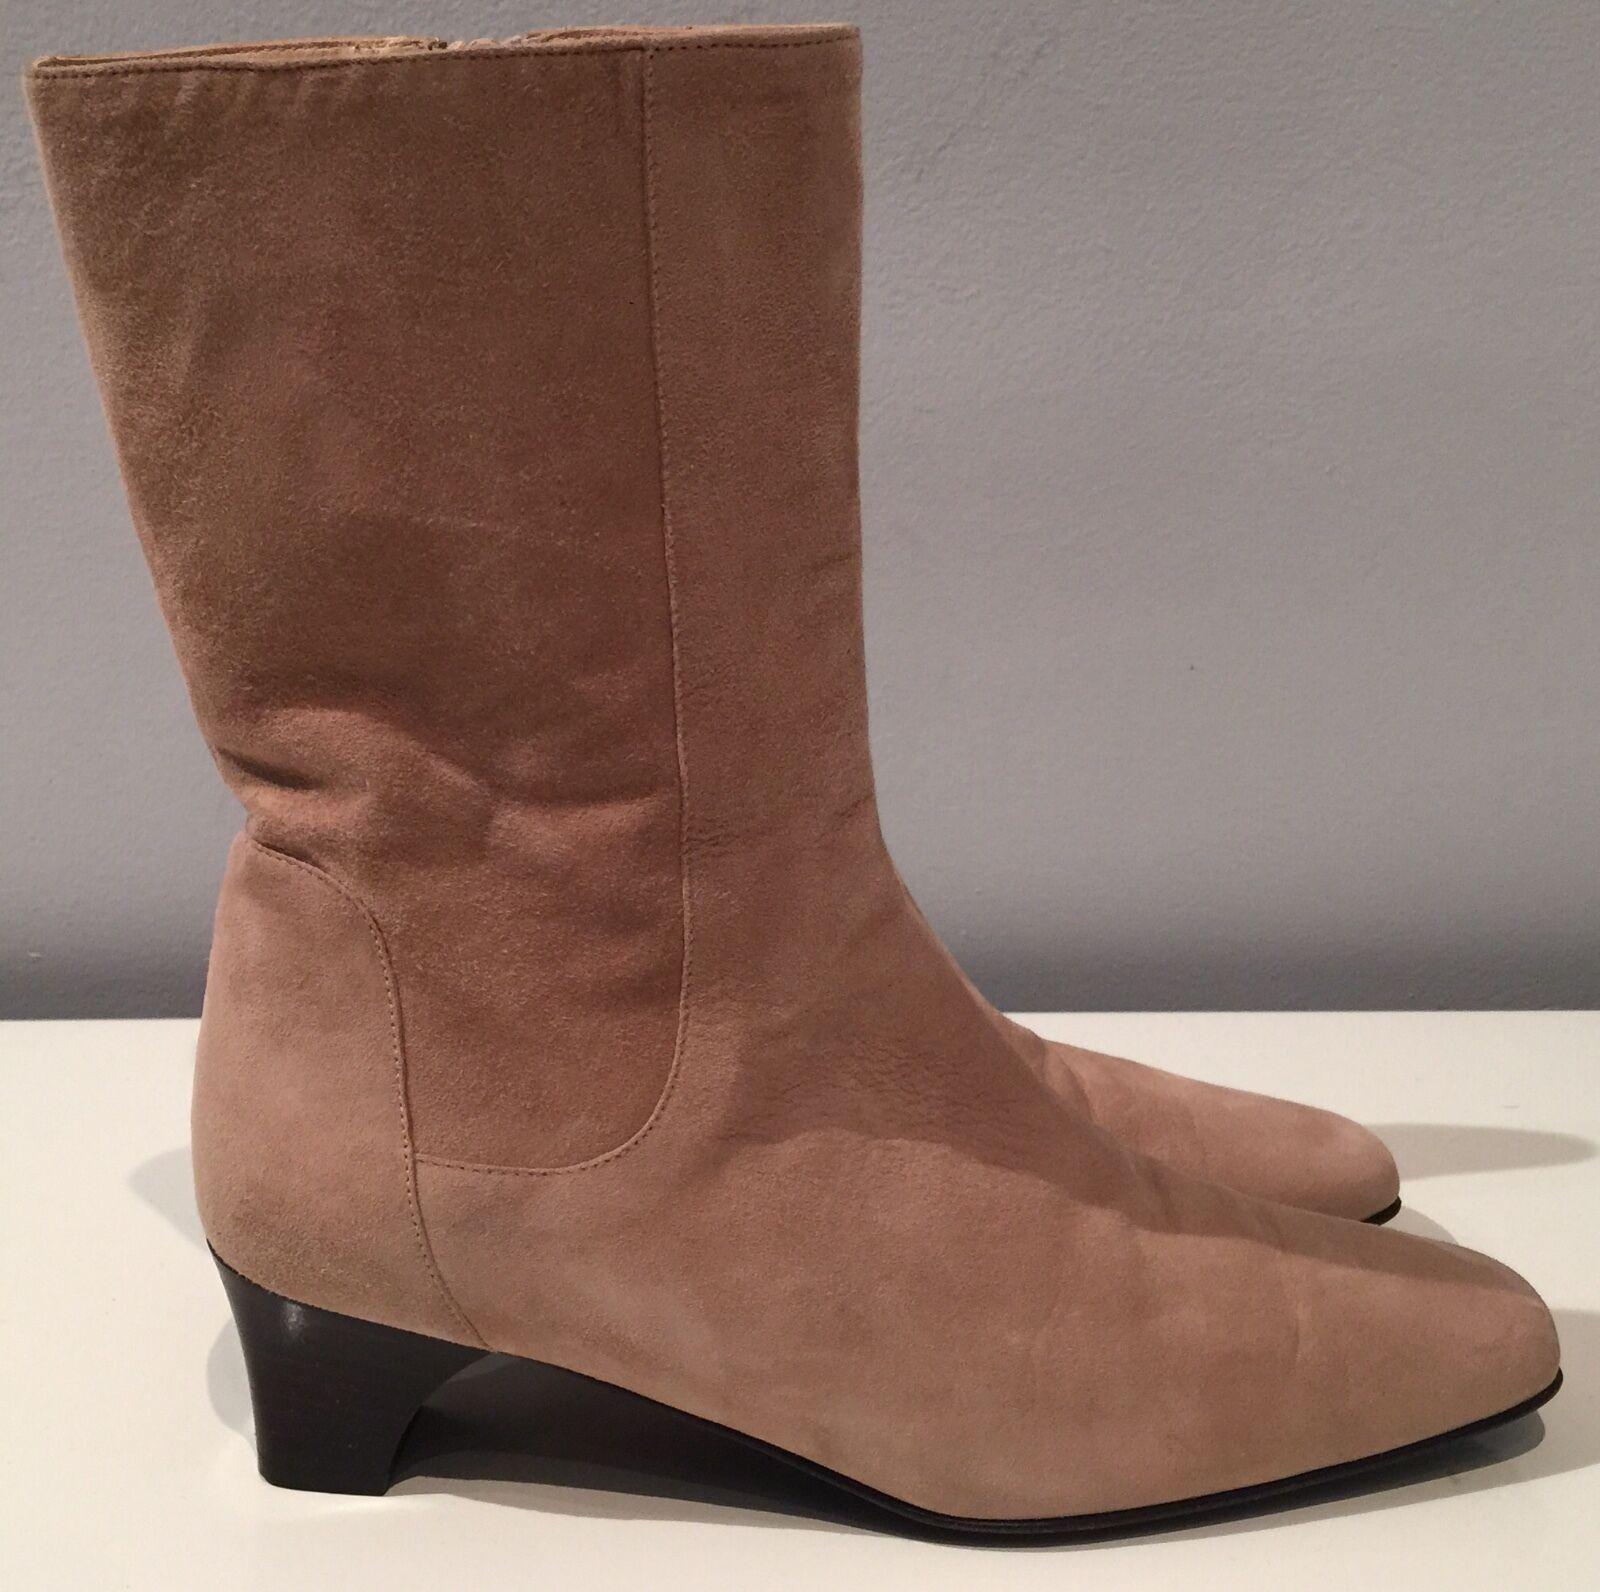 Authentic Cole Haan made in  beige suede boots chunky kitten heel 6.5 C